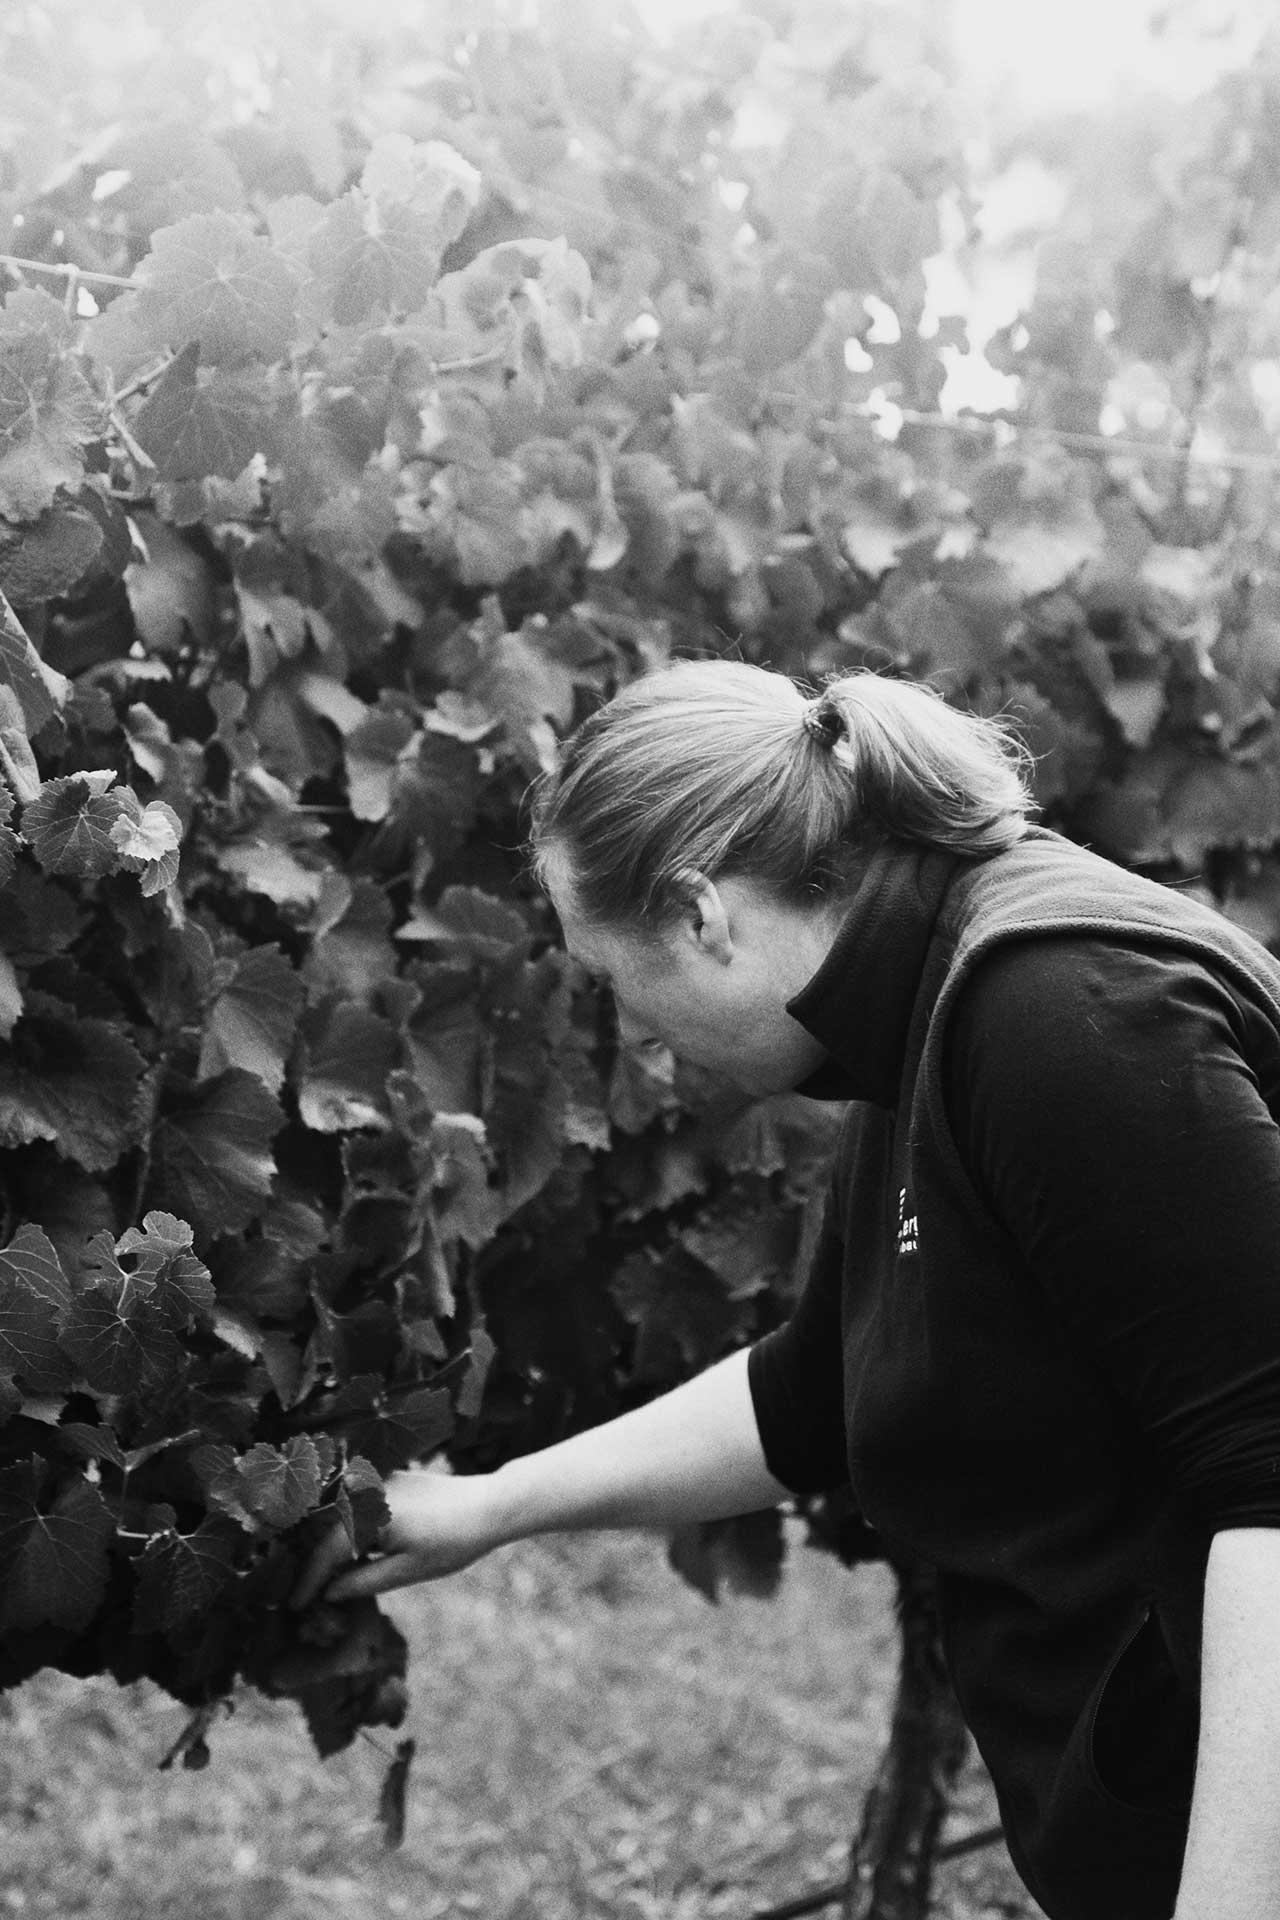 Caroline in a field, black and white.